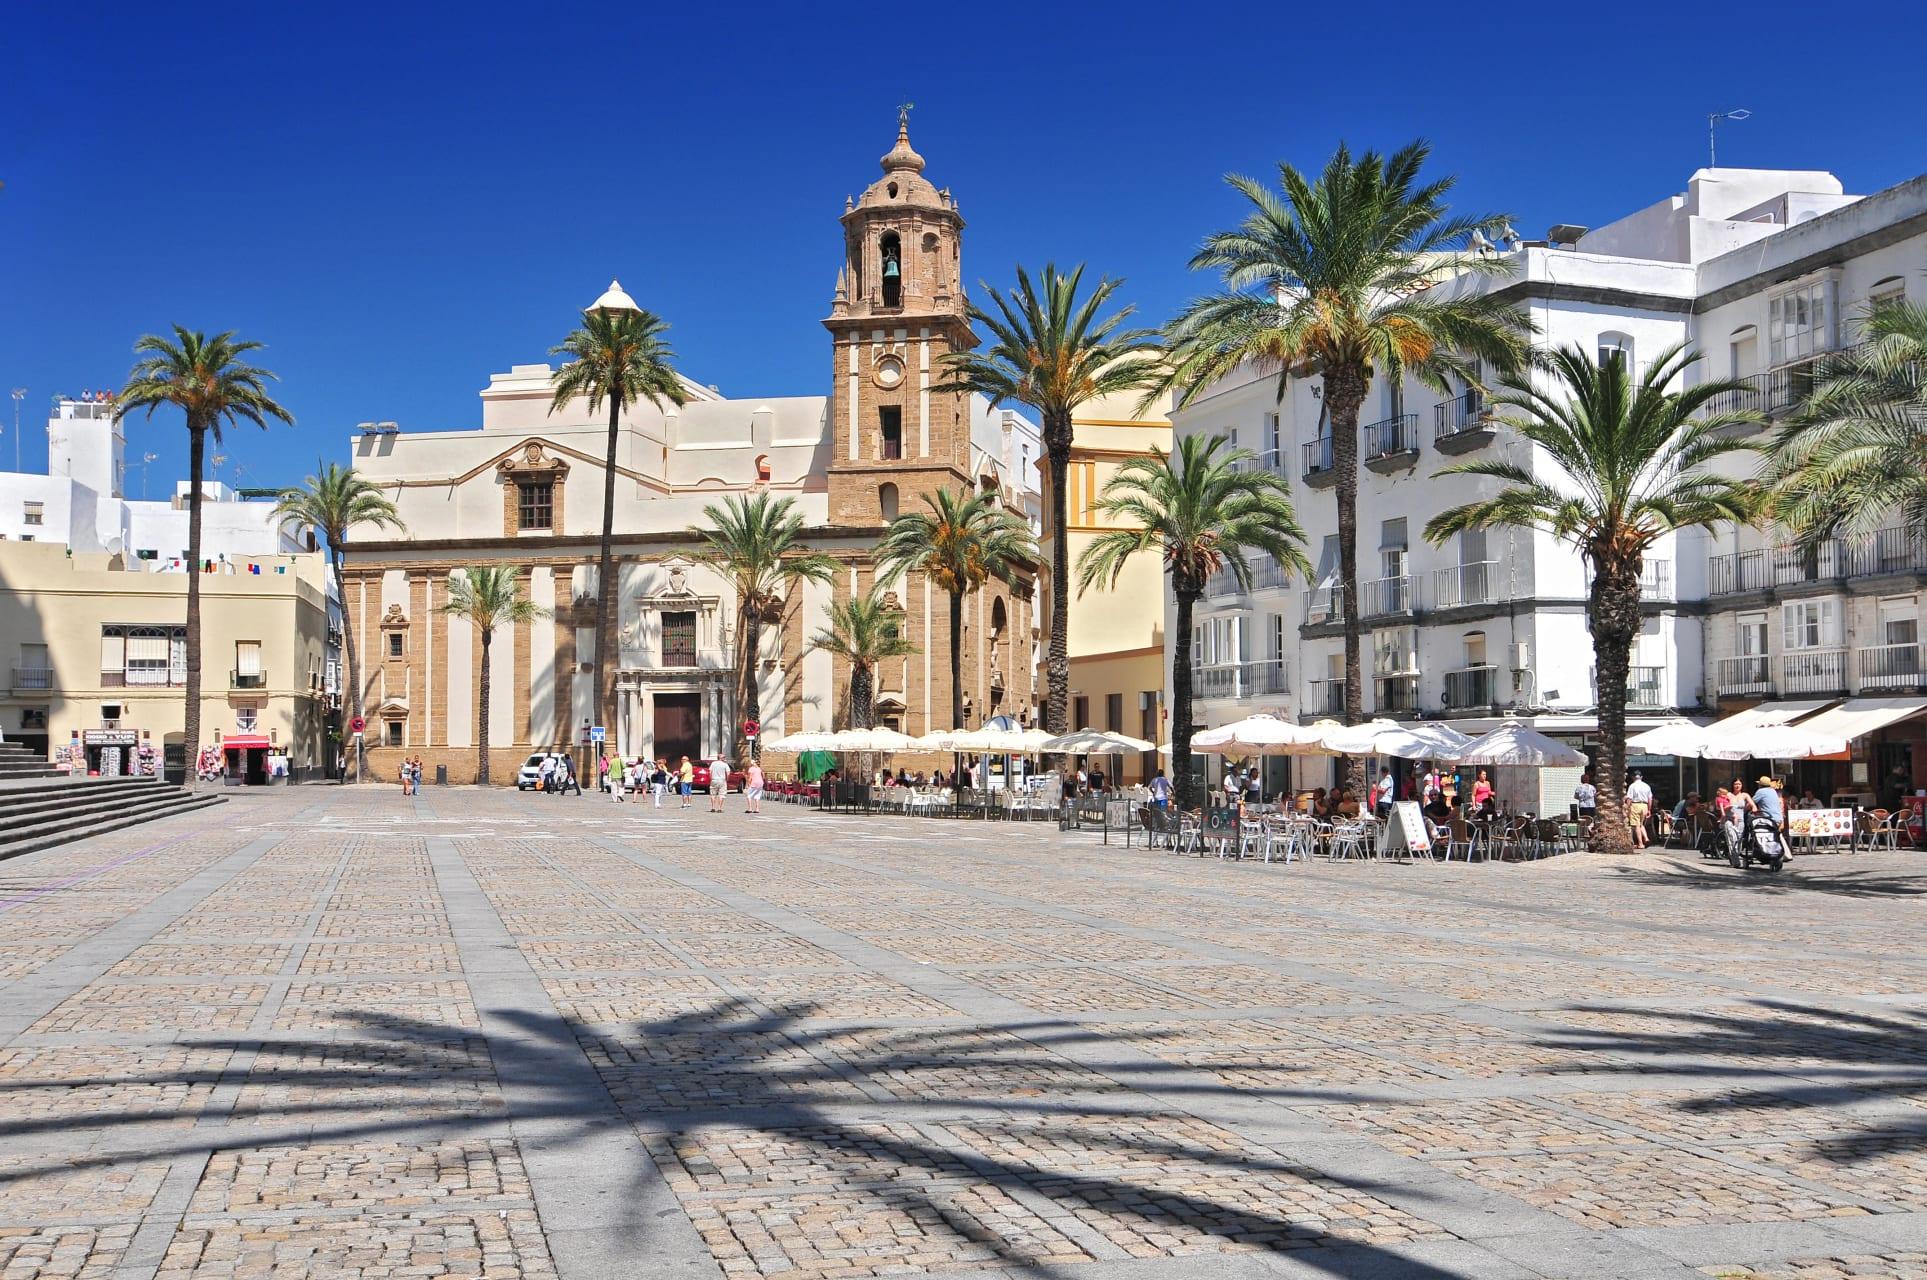 Cádiz - Cádiz: History, Carnival and Humour